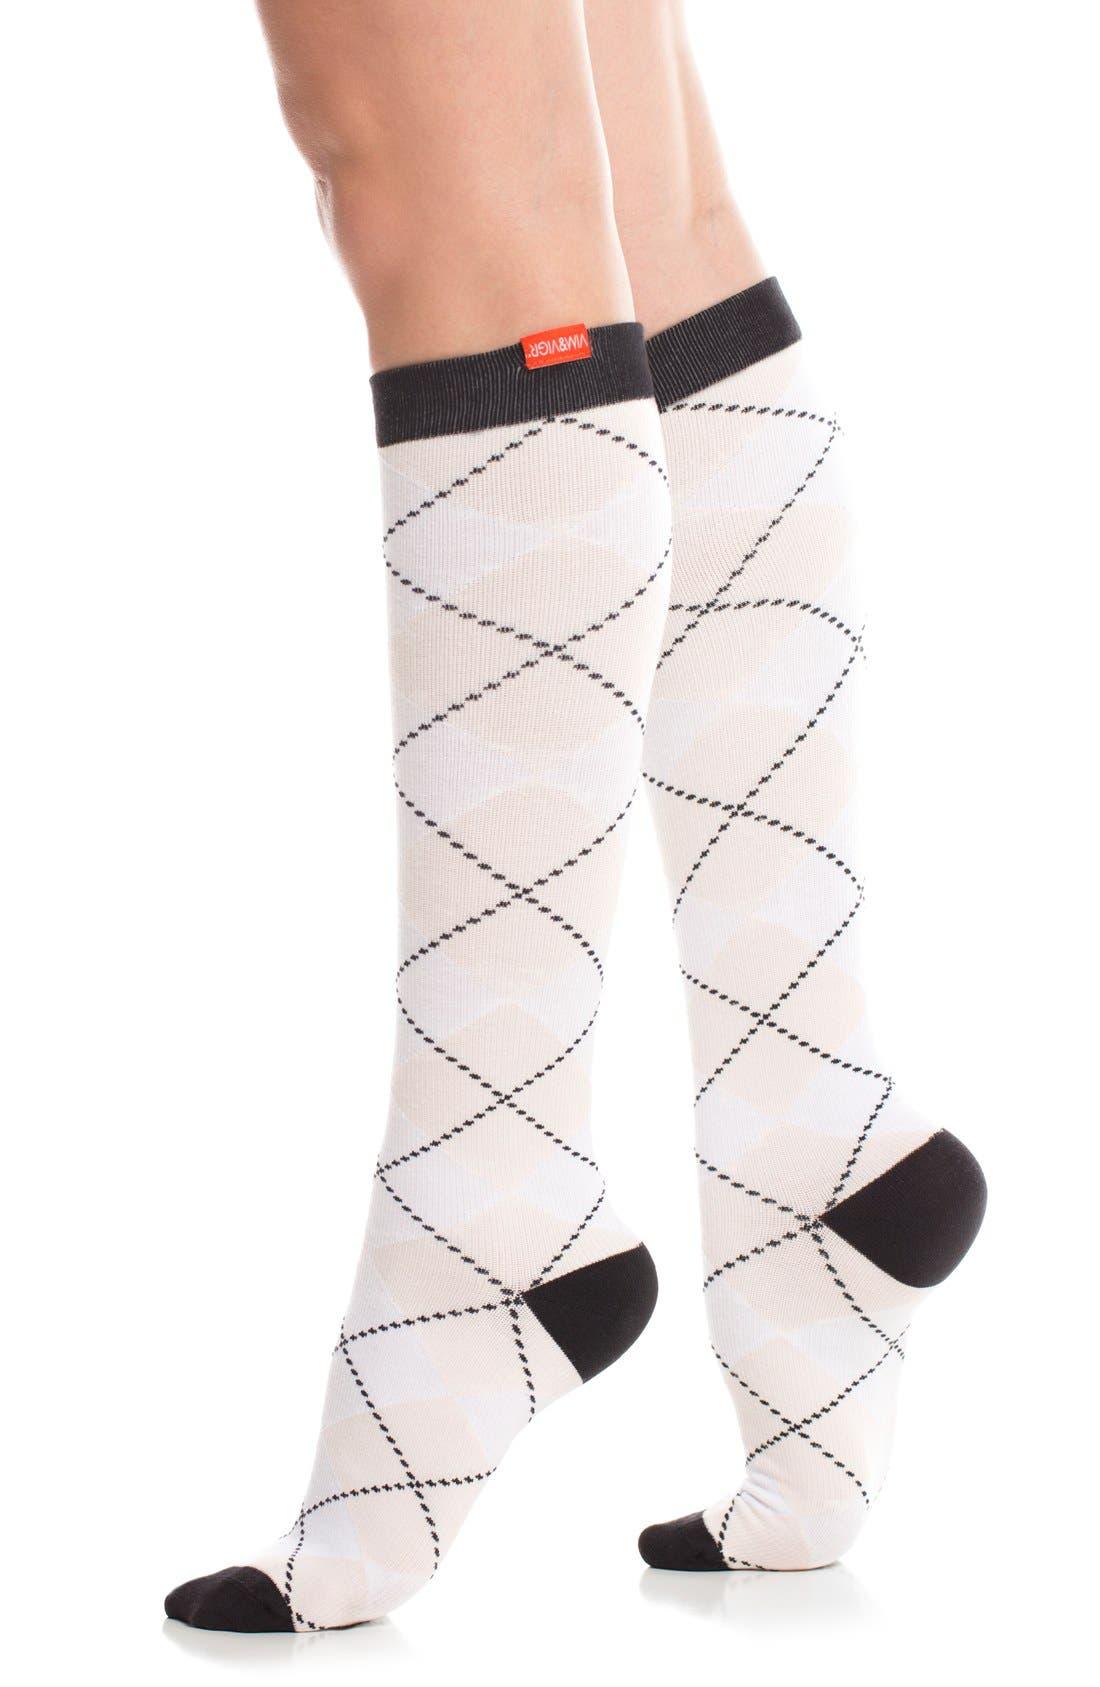 Argyle Graduated Compression Trouser Socks,                             Main thumbnail 1, color,                             101